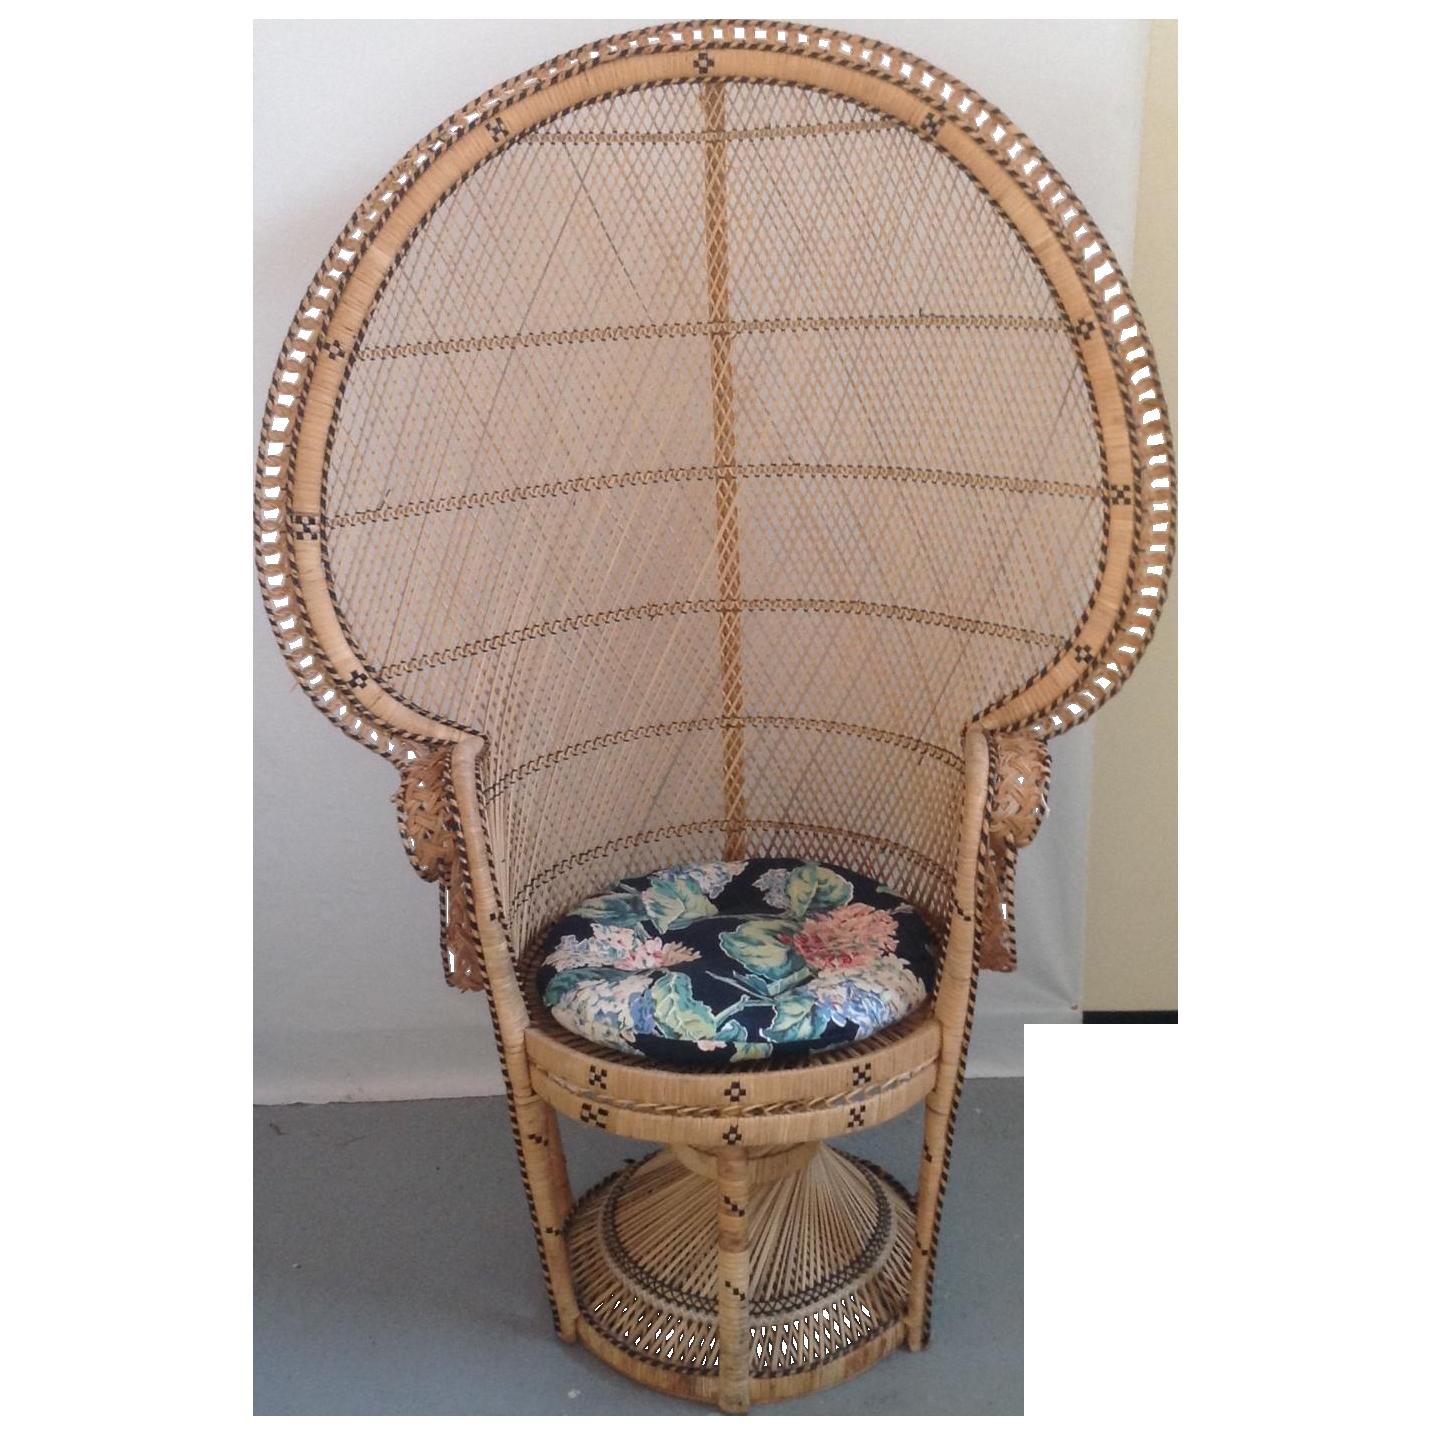 Mid Century Hollywood Regency Wicker Peacock Chair on Chairish